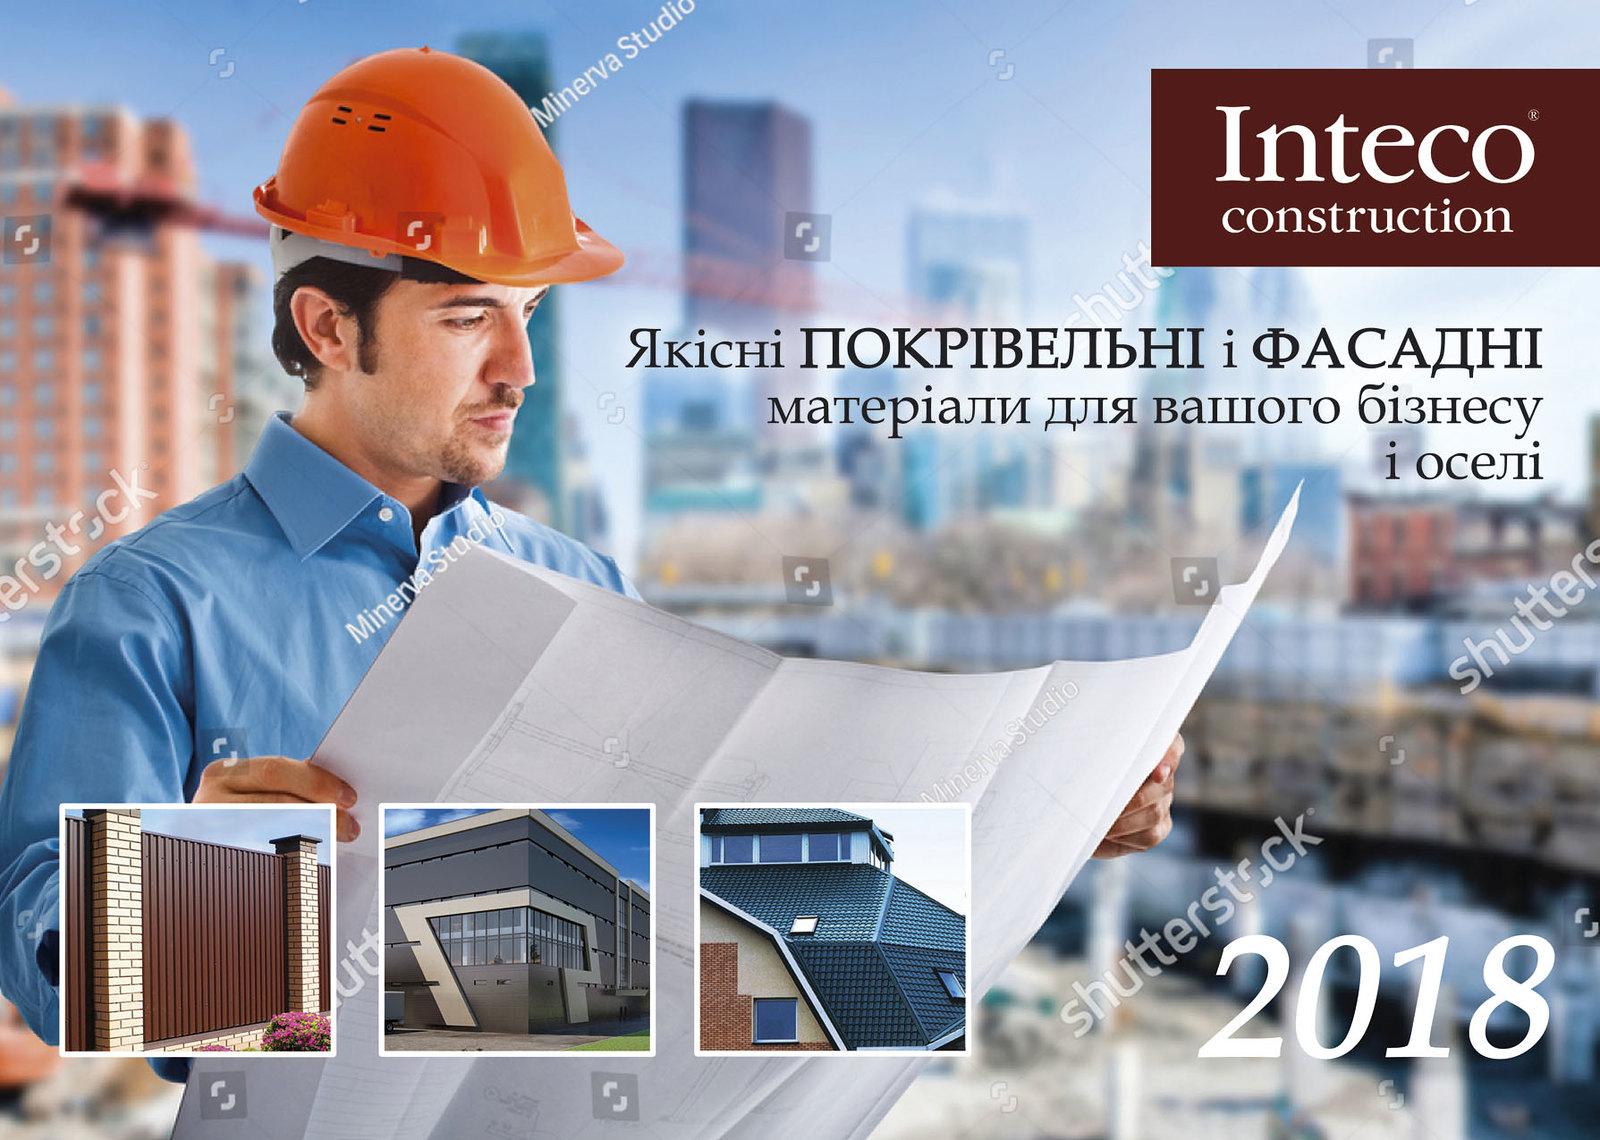 (01) Kalend Inteco 01 verh 09